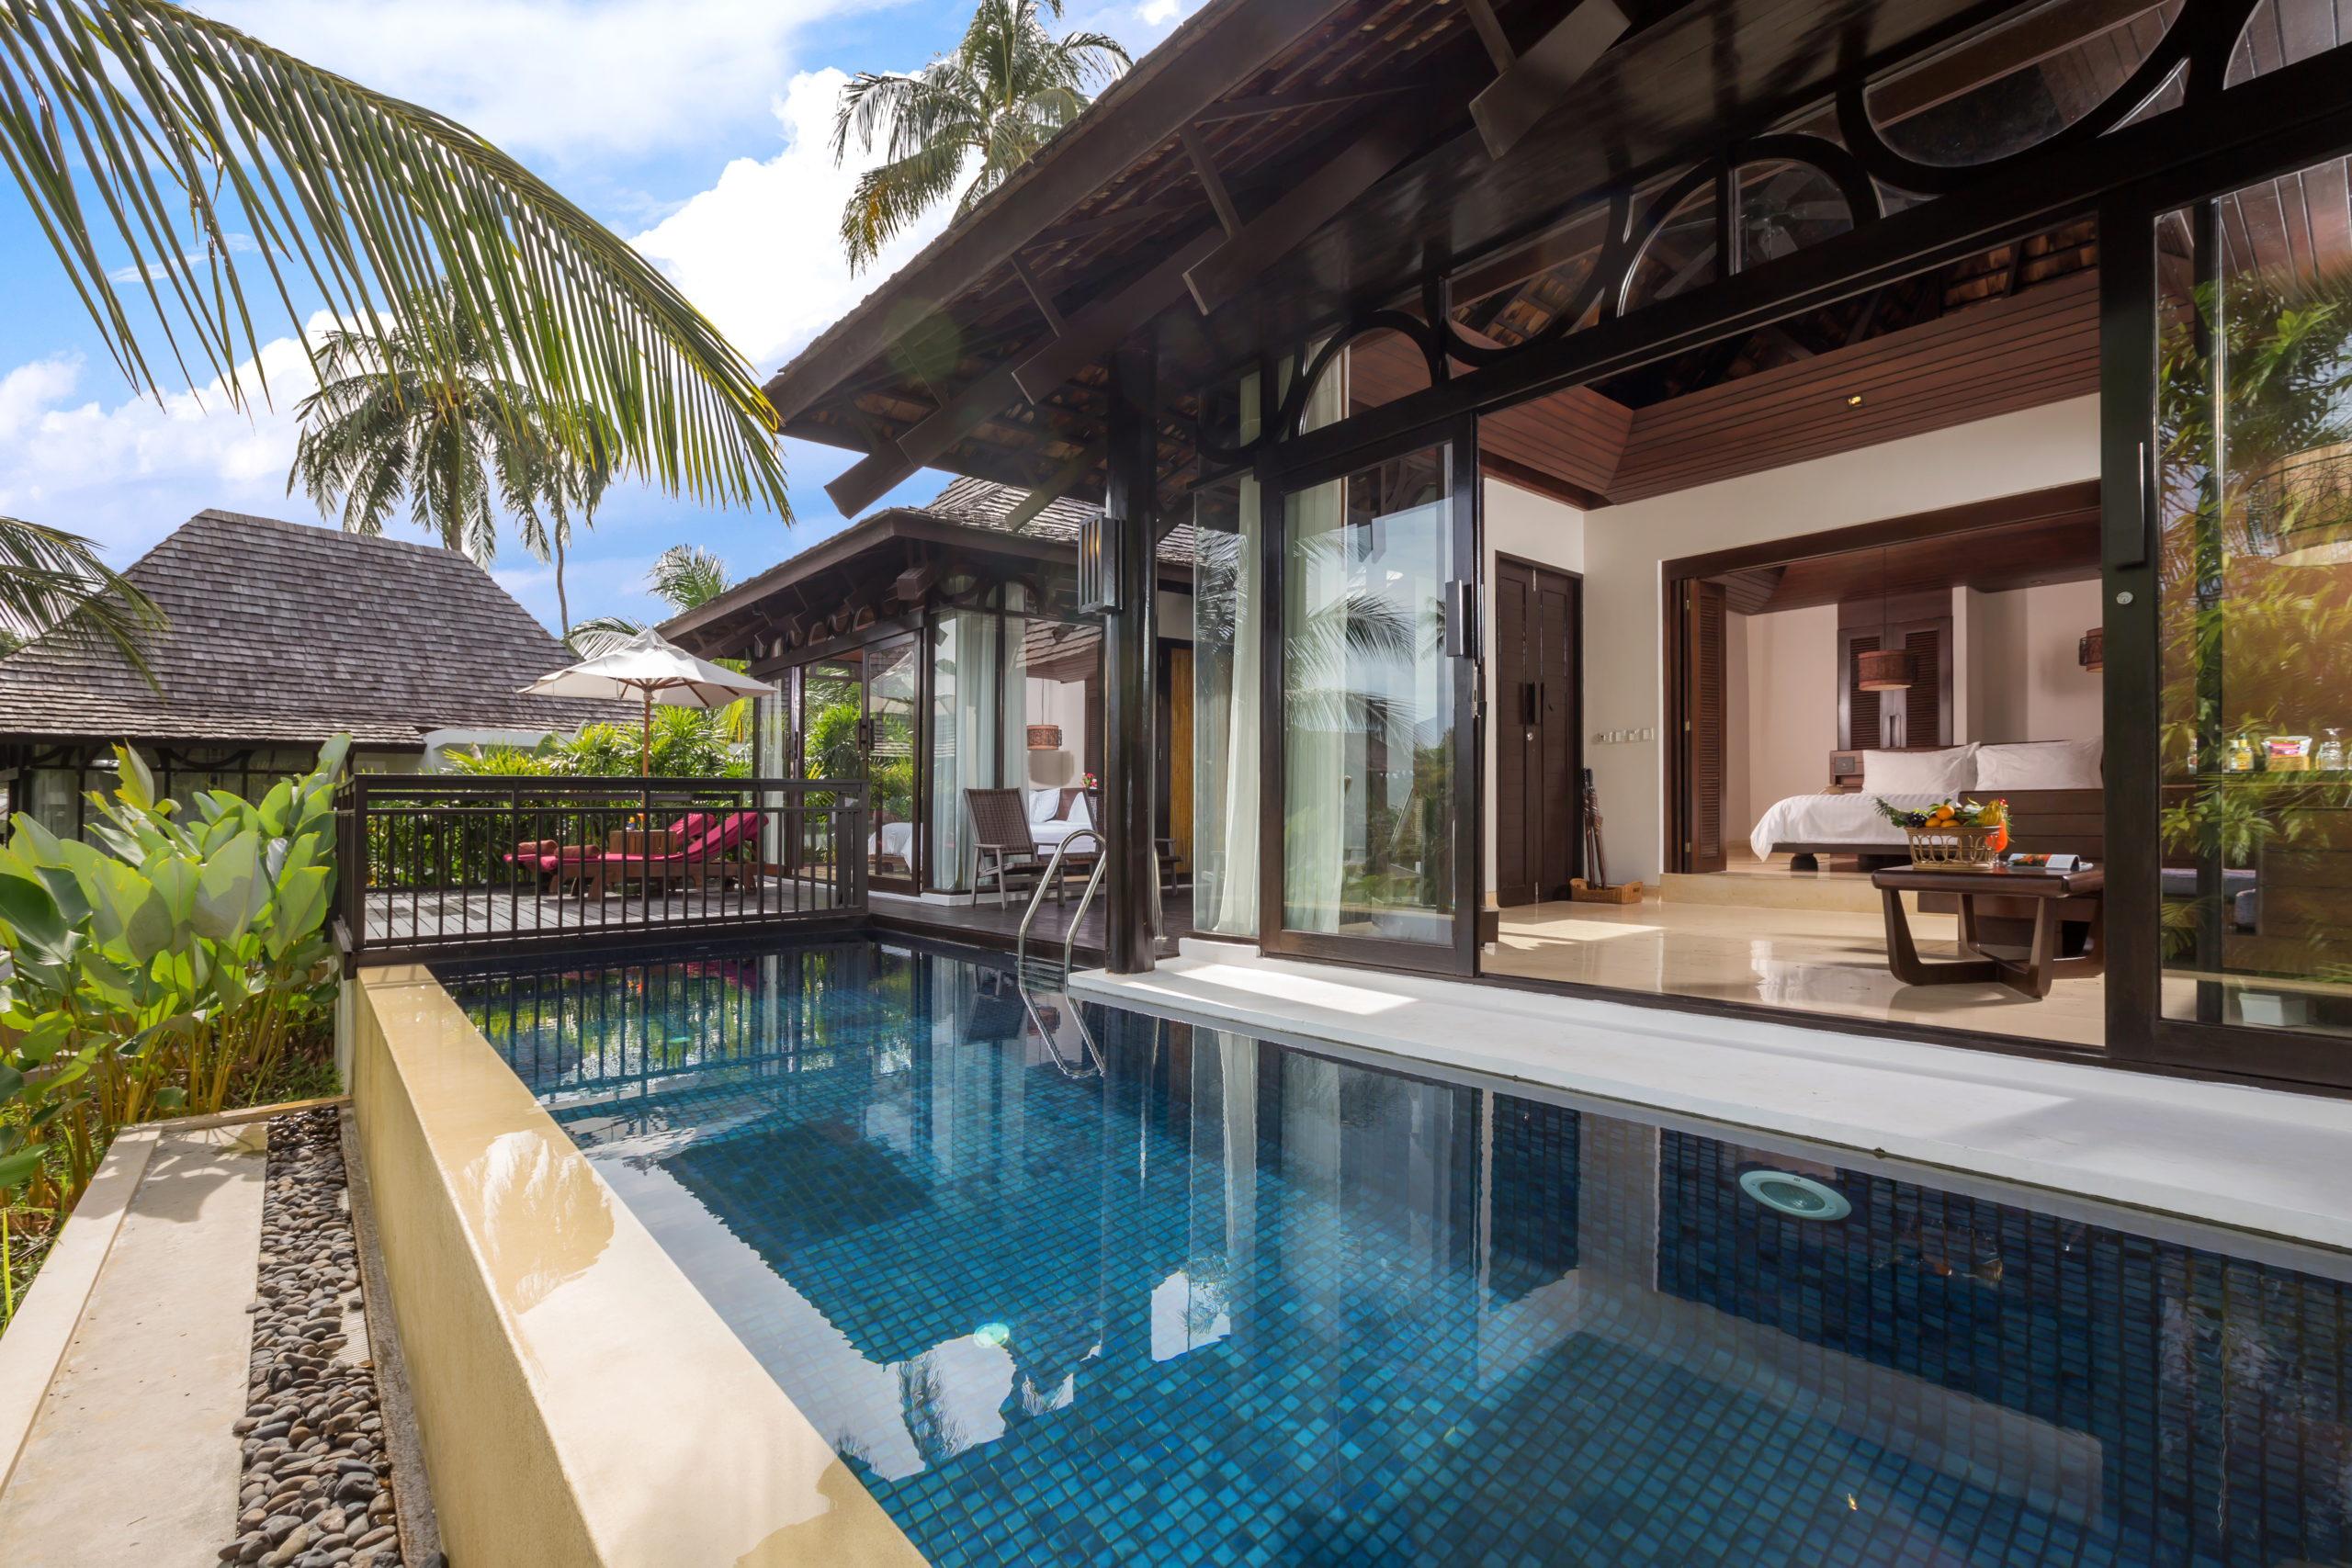 020_Two-Bedroom Pool Villa_Terrace The Vijitt Resort Phuket - Copy